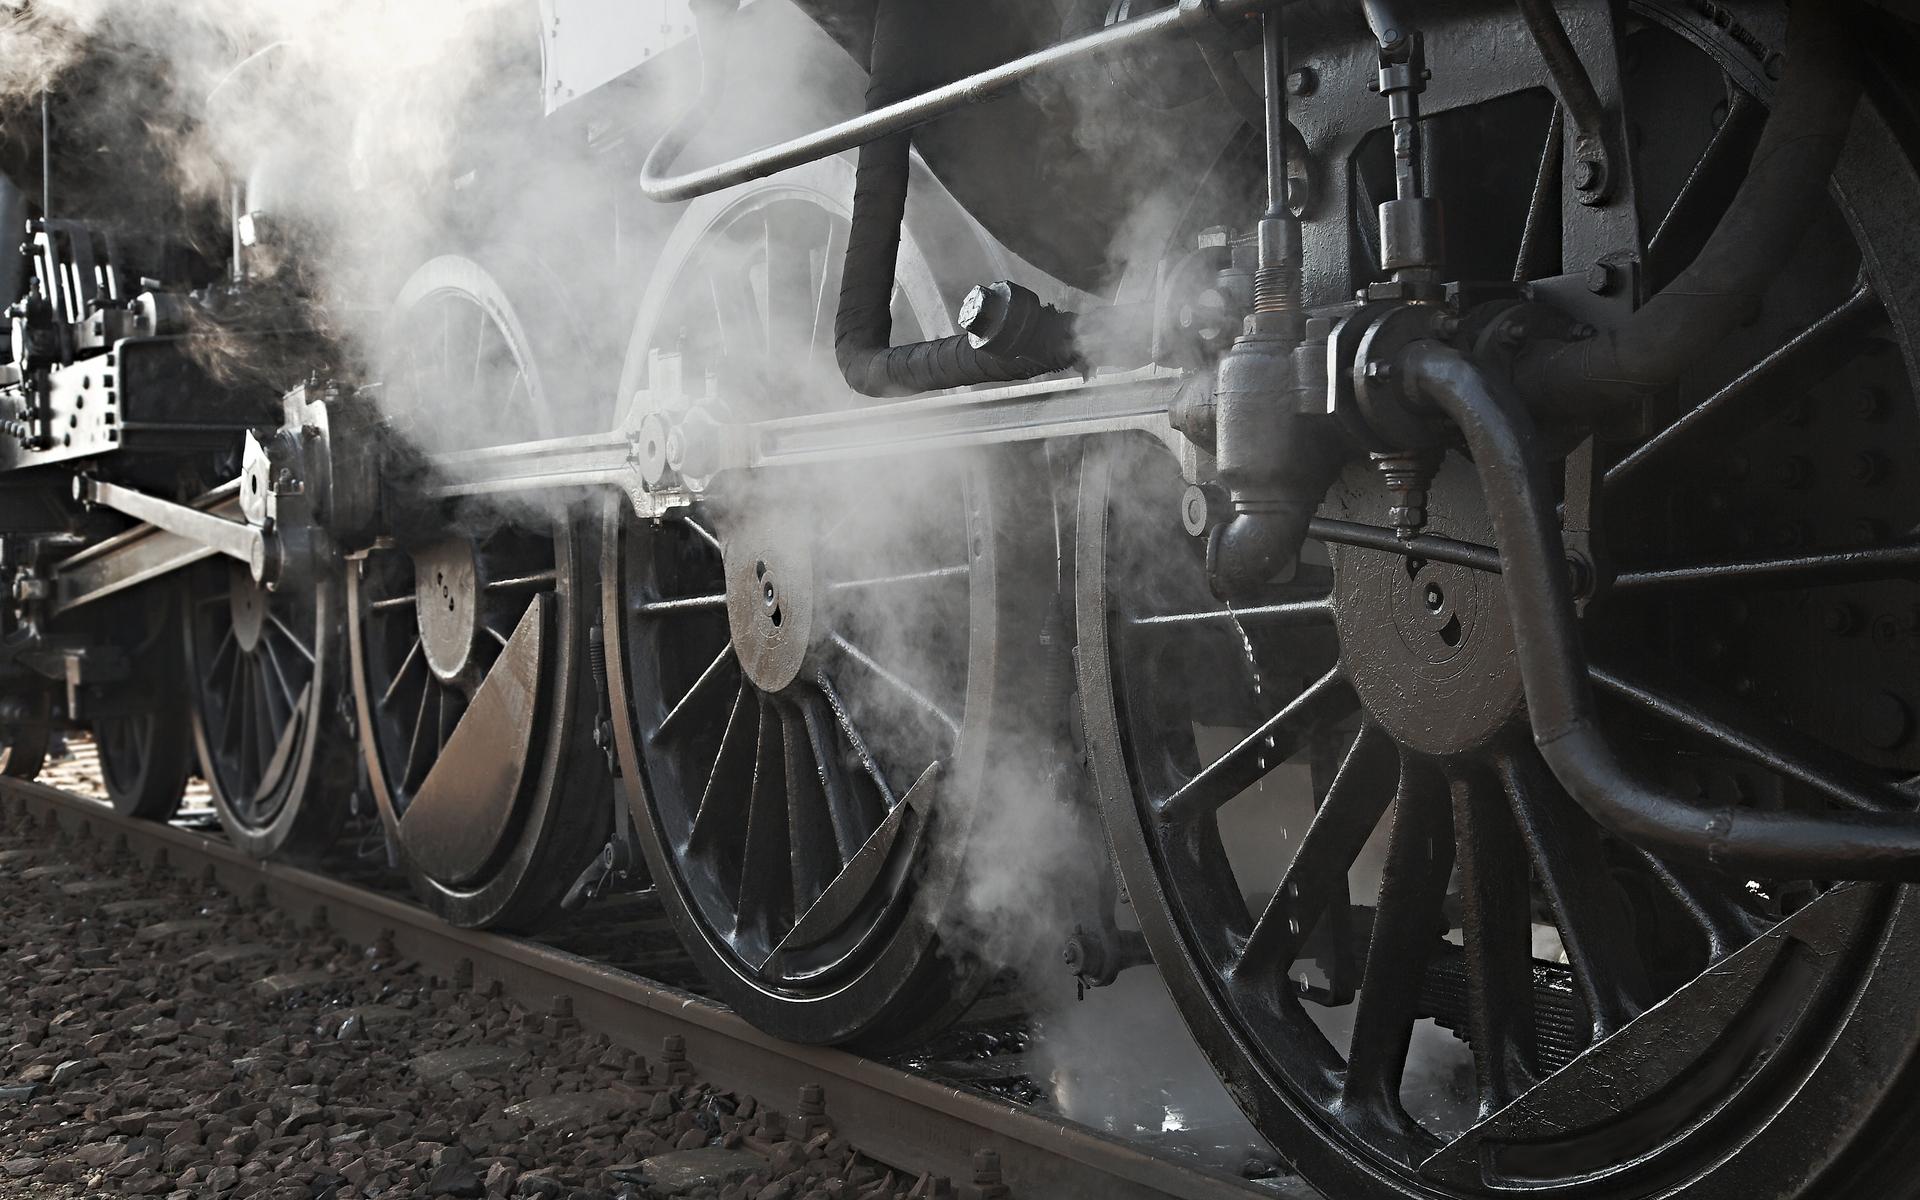 bakkt revolution industrial age bitcoin steam train